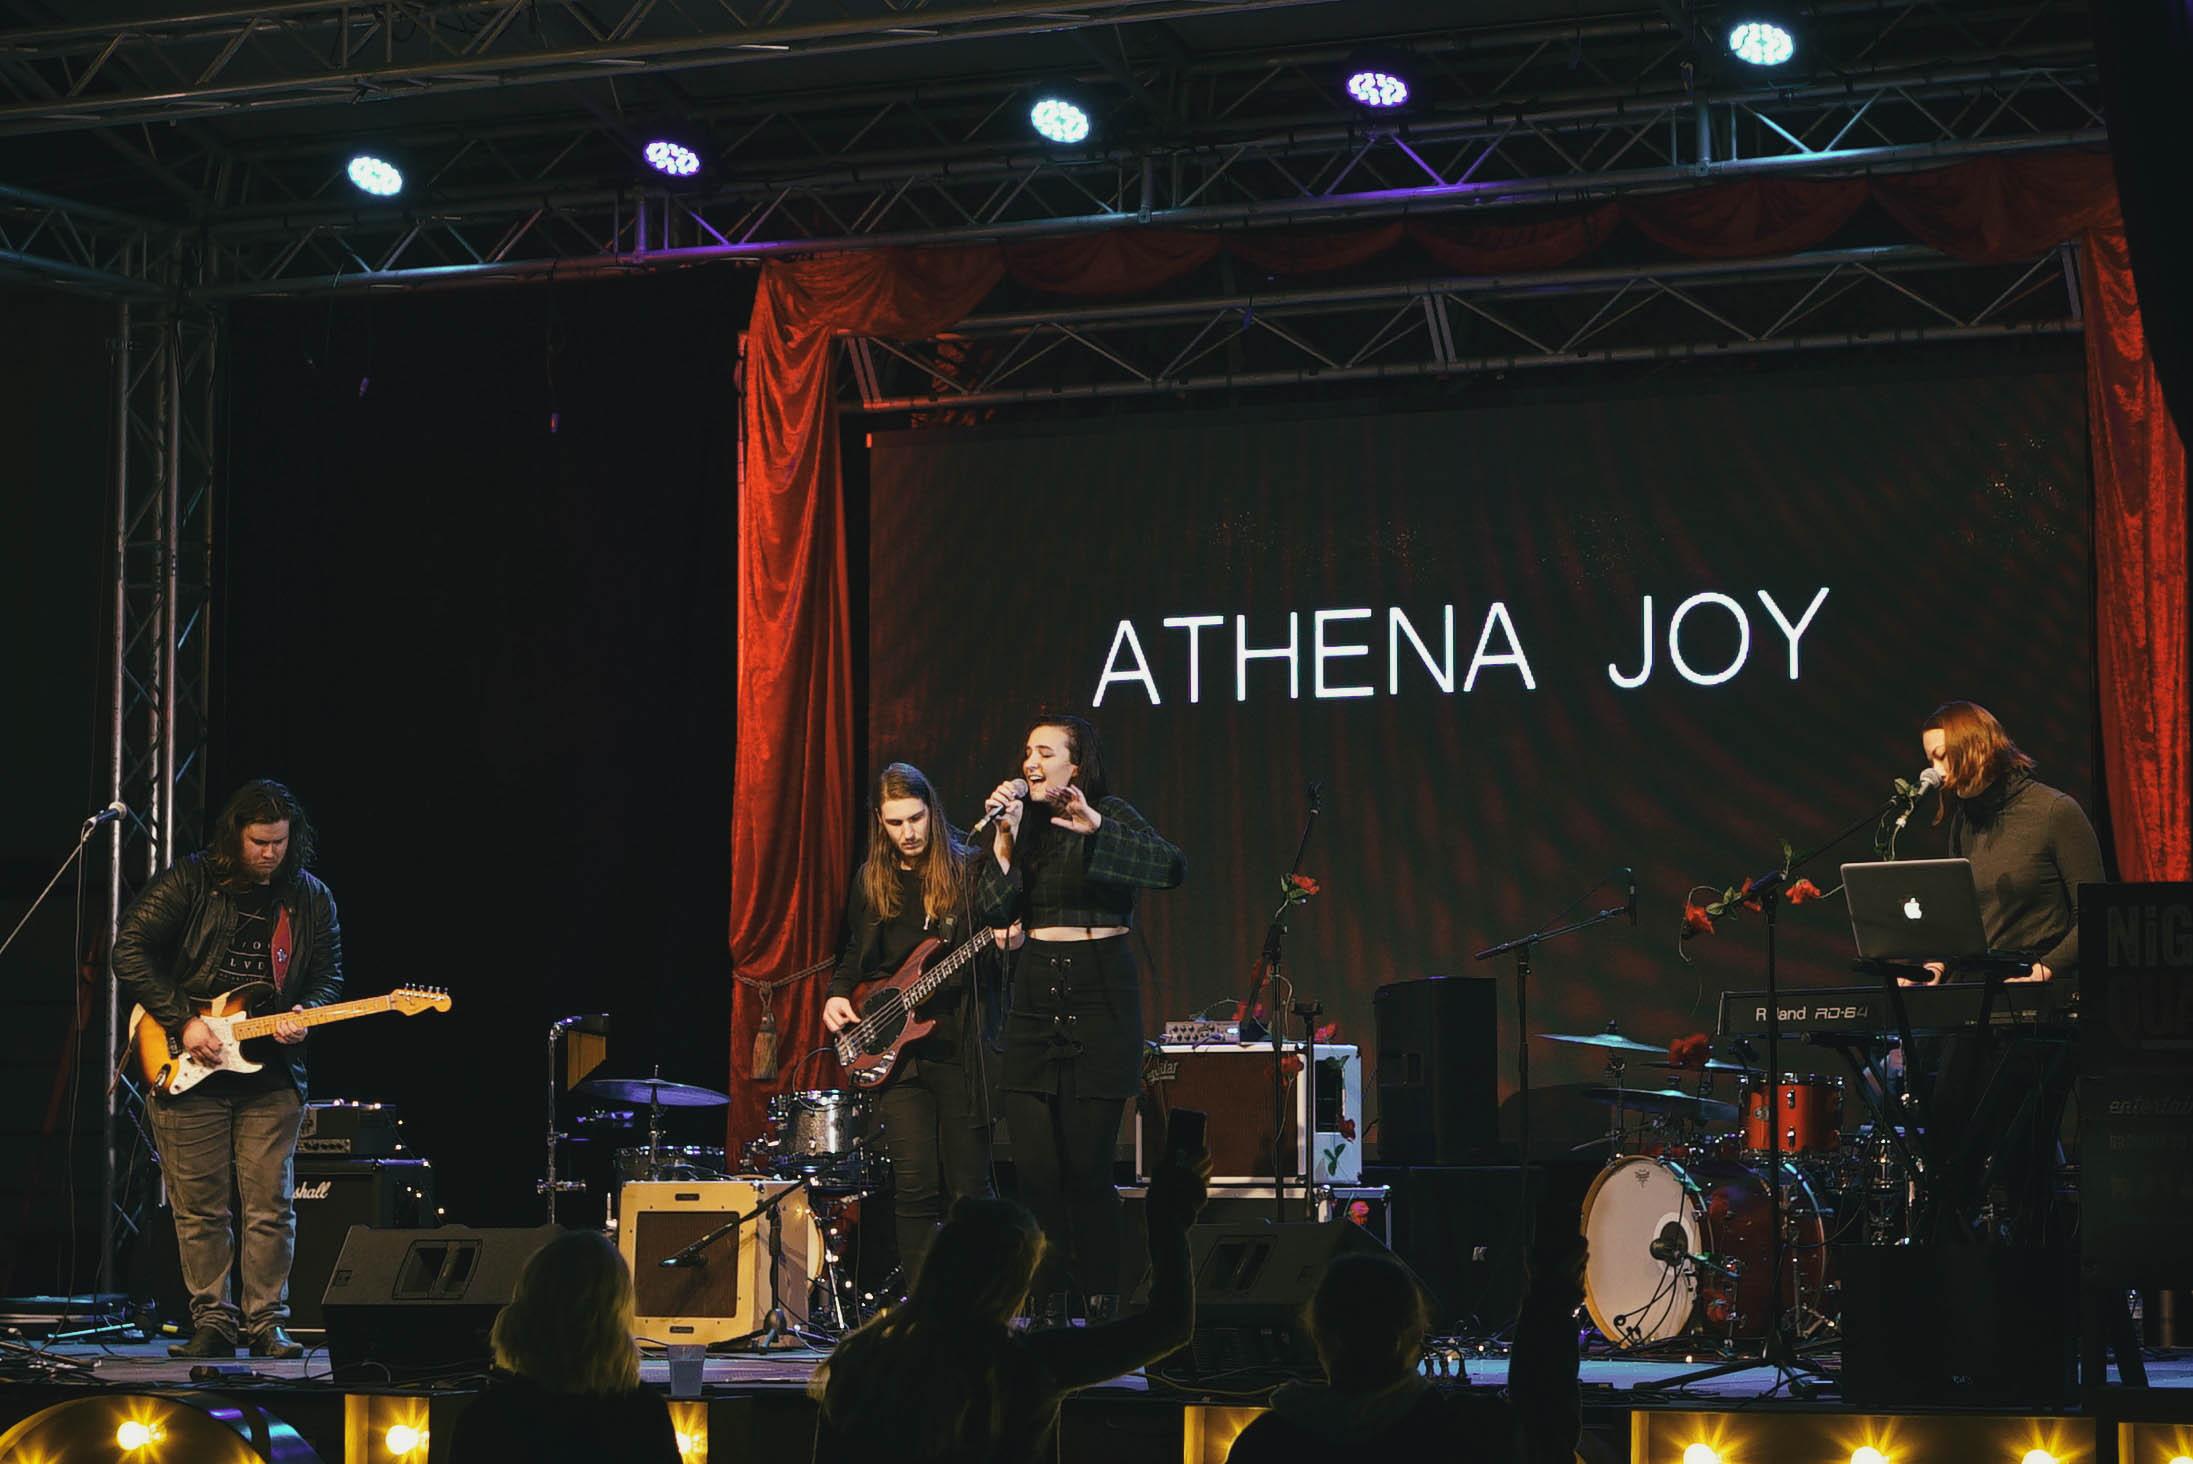 Athena Joy onstage at NightQuarter 2018